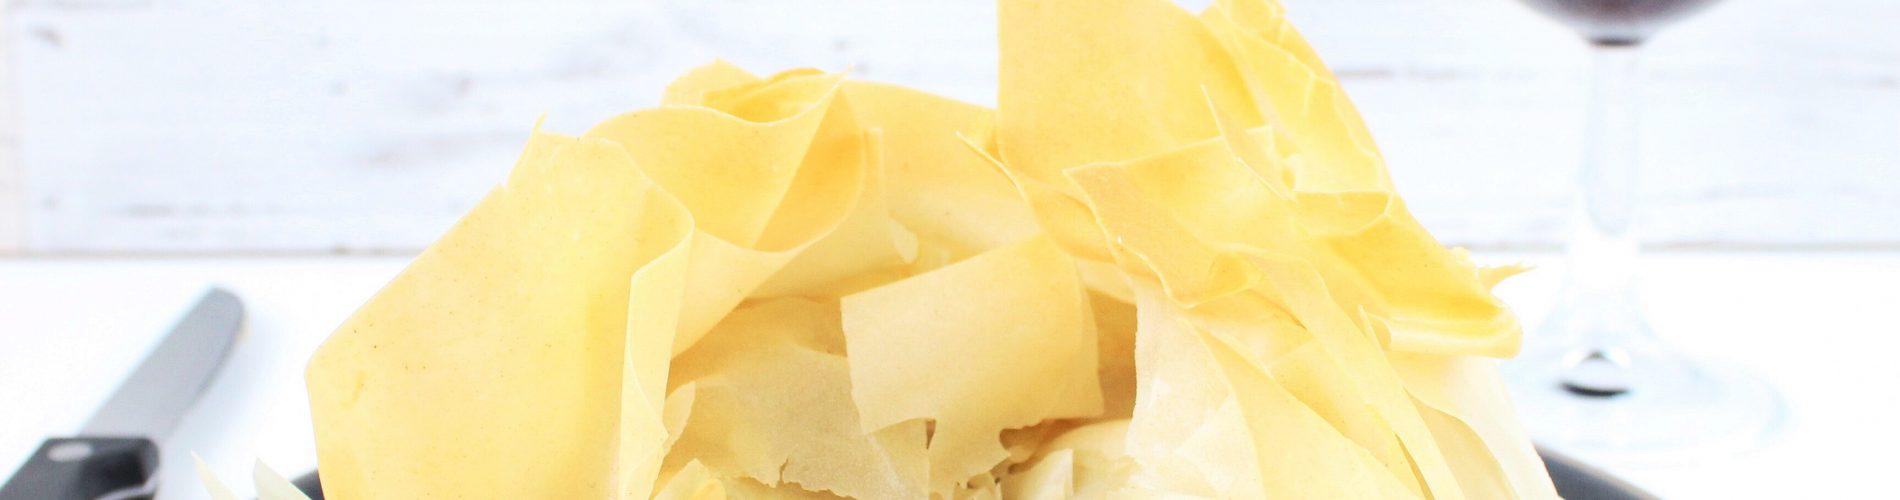 Hartige hapjes   camembert in filodeeg